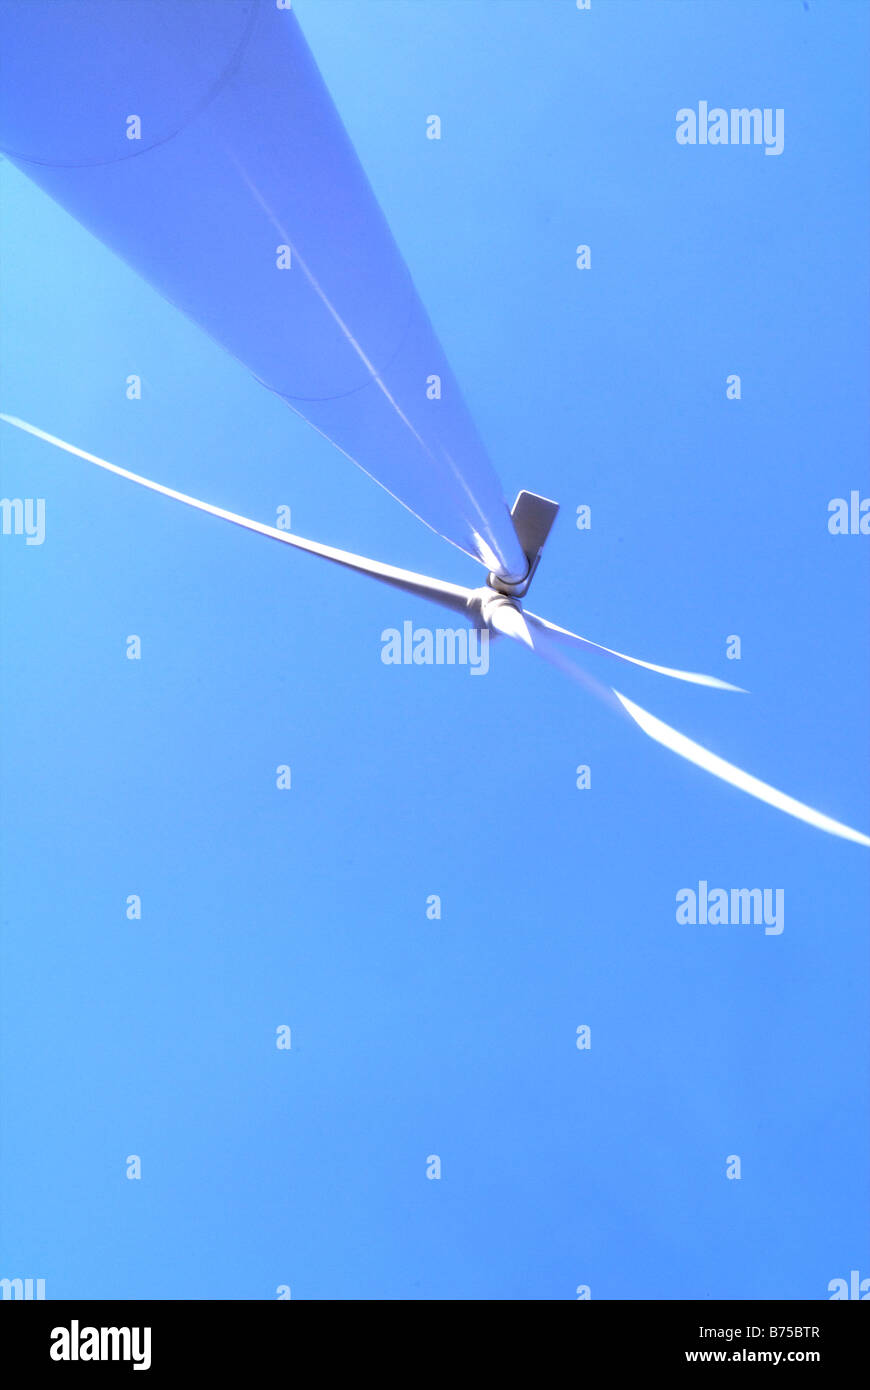 Extreme low angle wind turbine - Stock Image